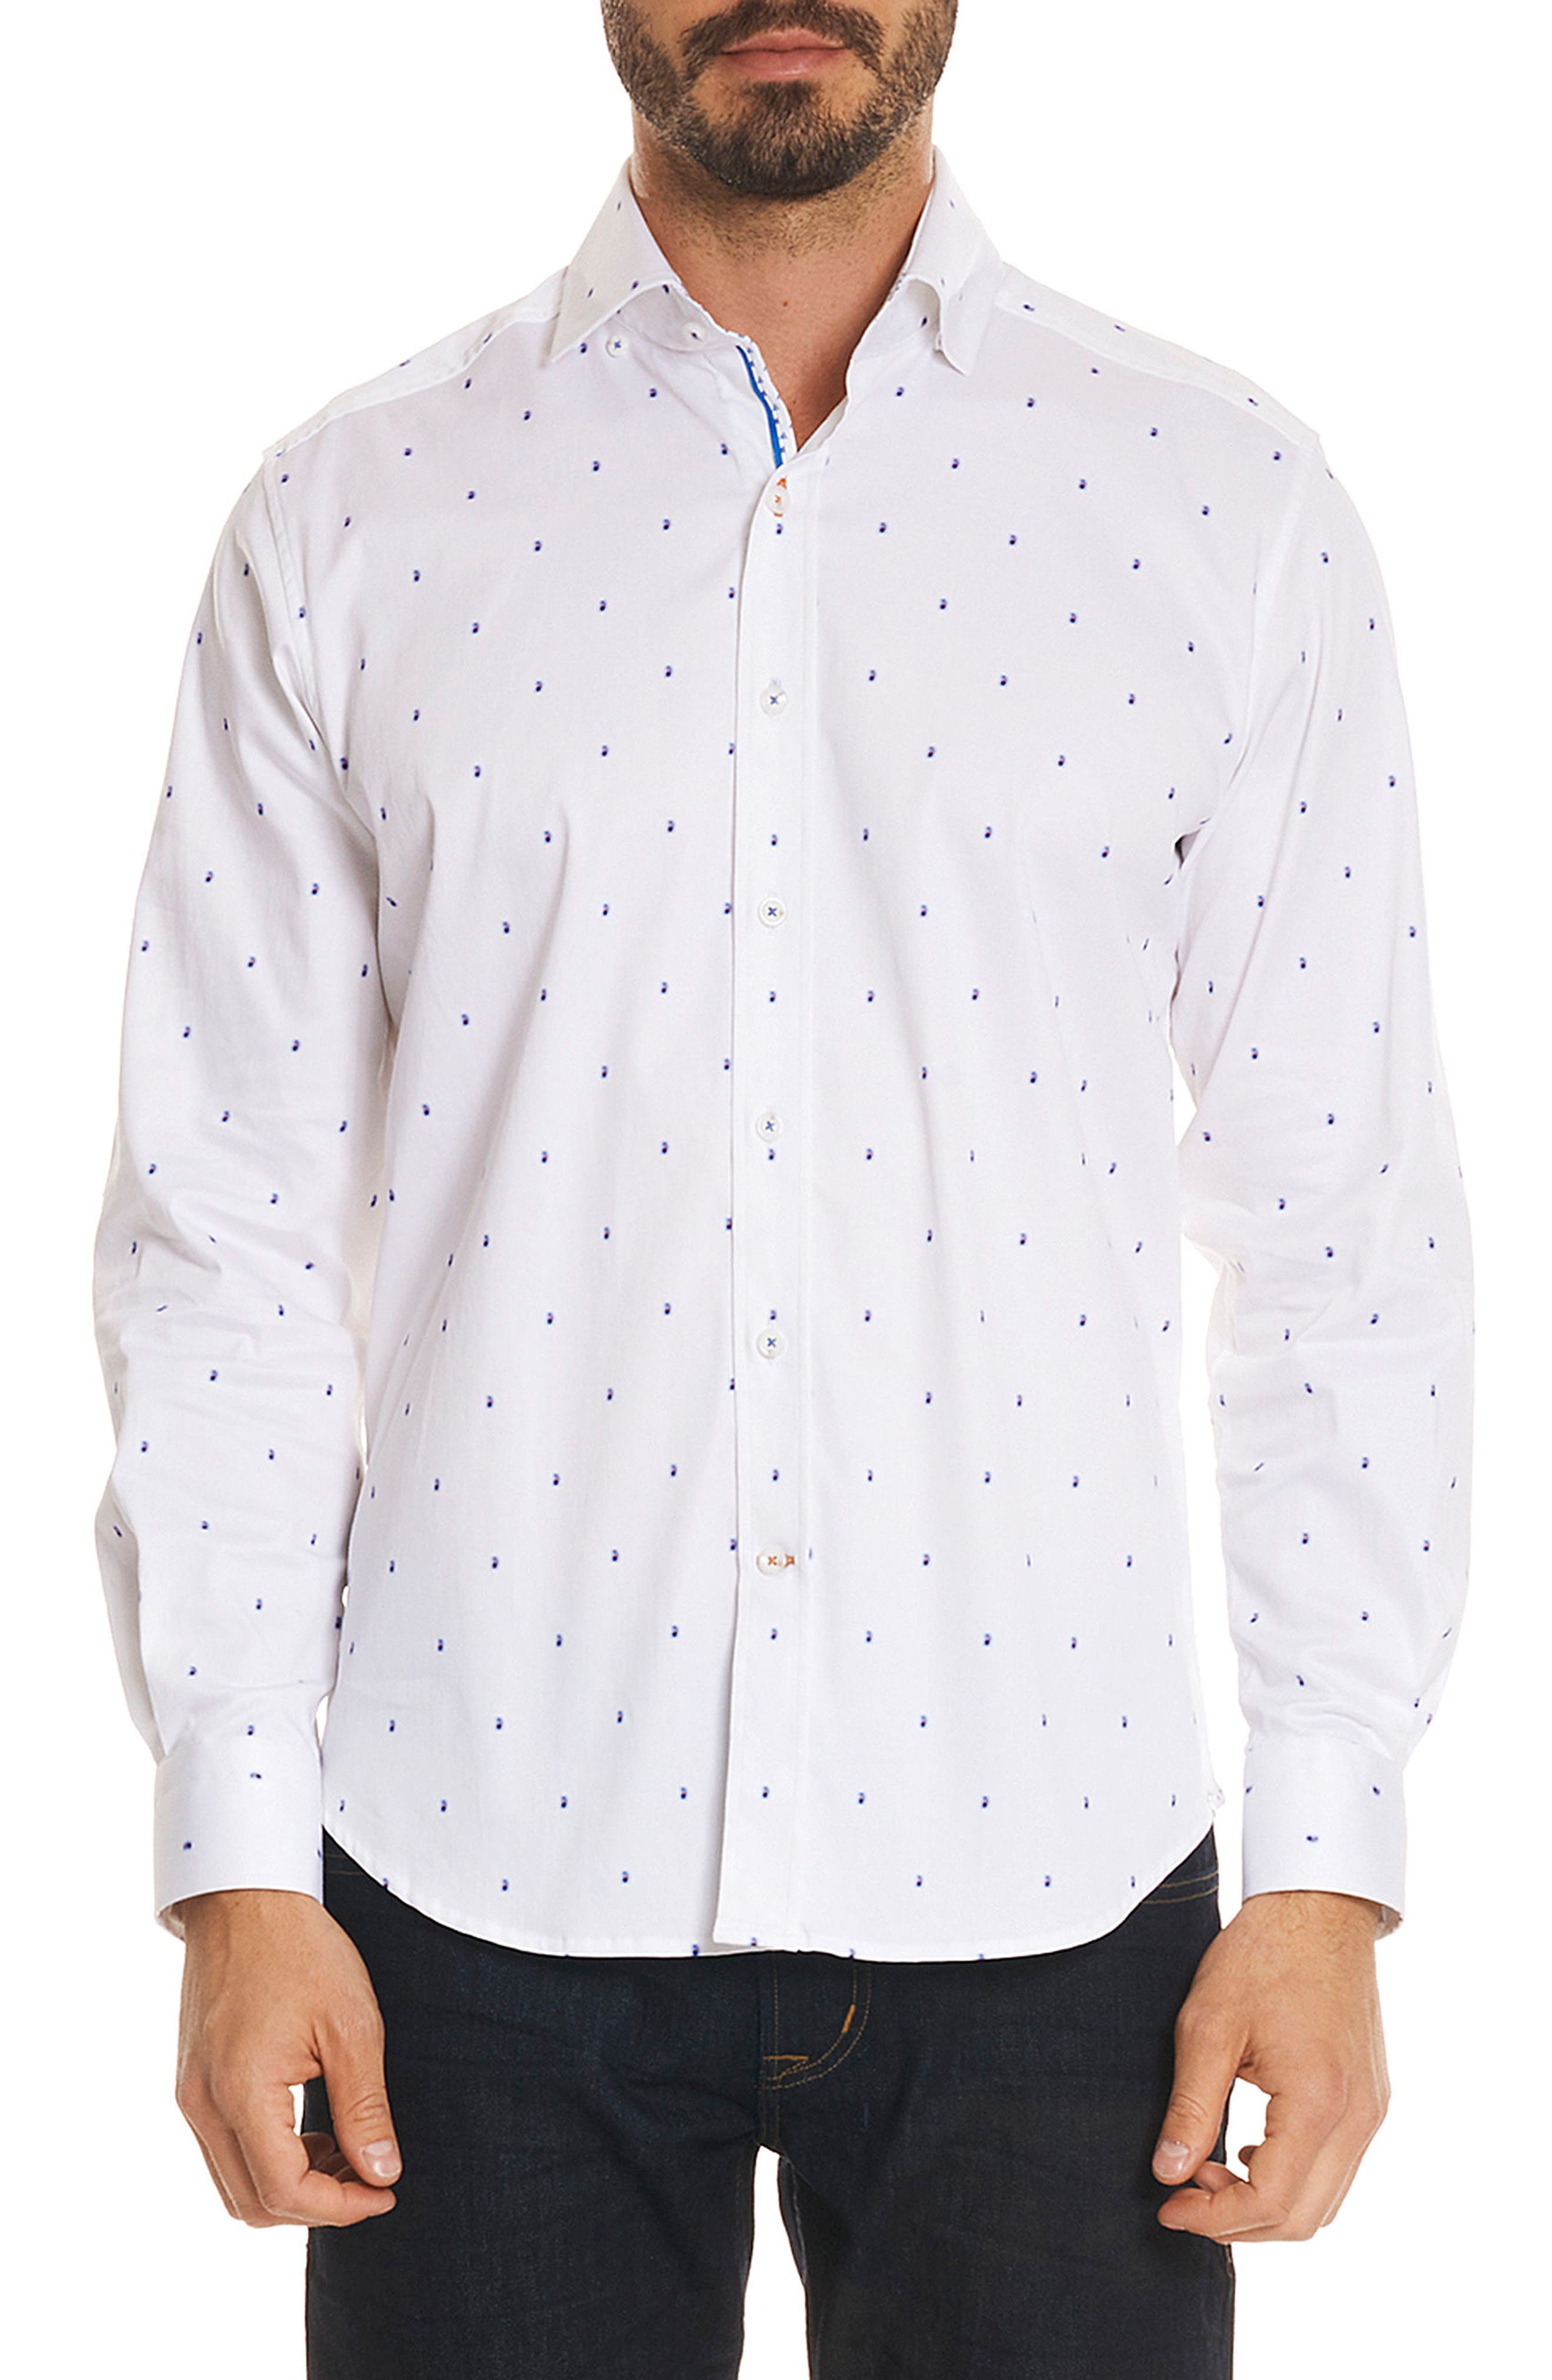 Mack Tailored Fit Sport Shirt,                             Main thumbnail 1, color,                             100